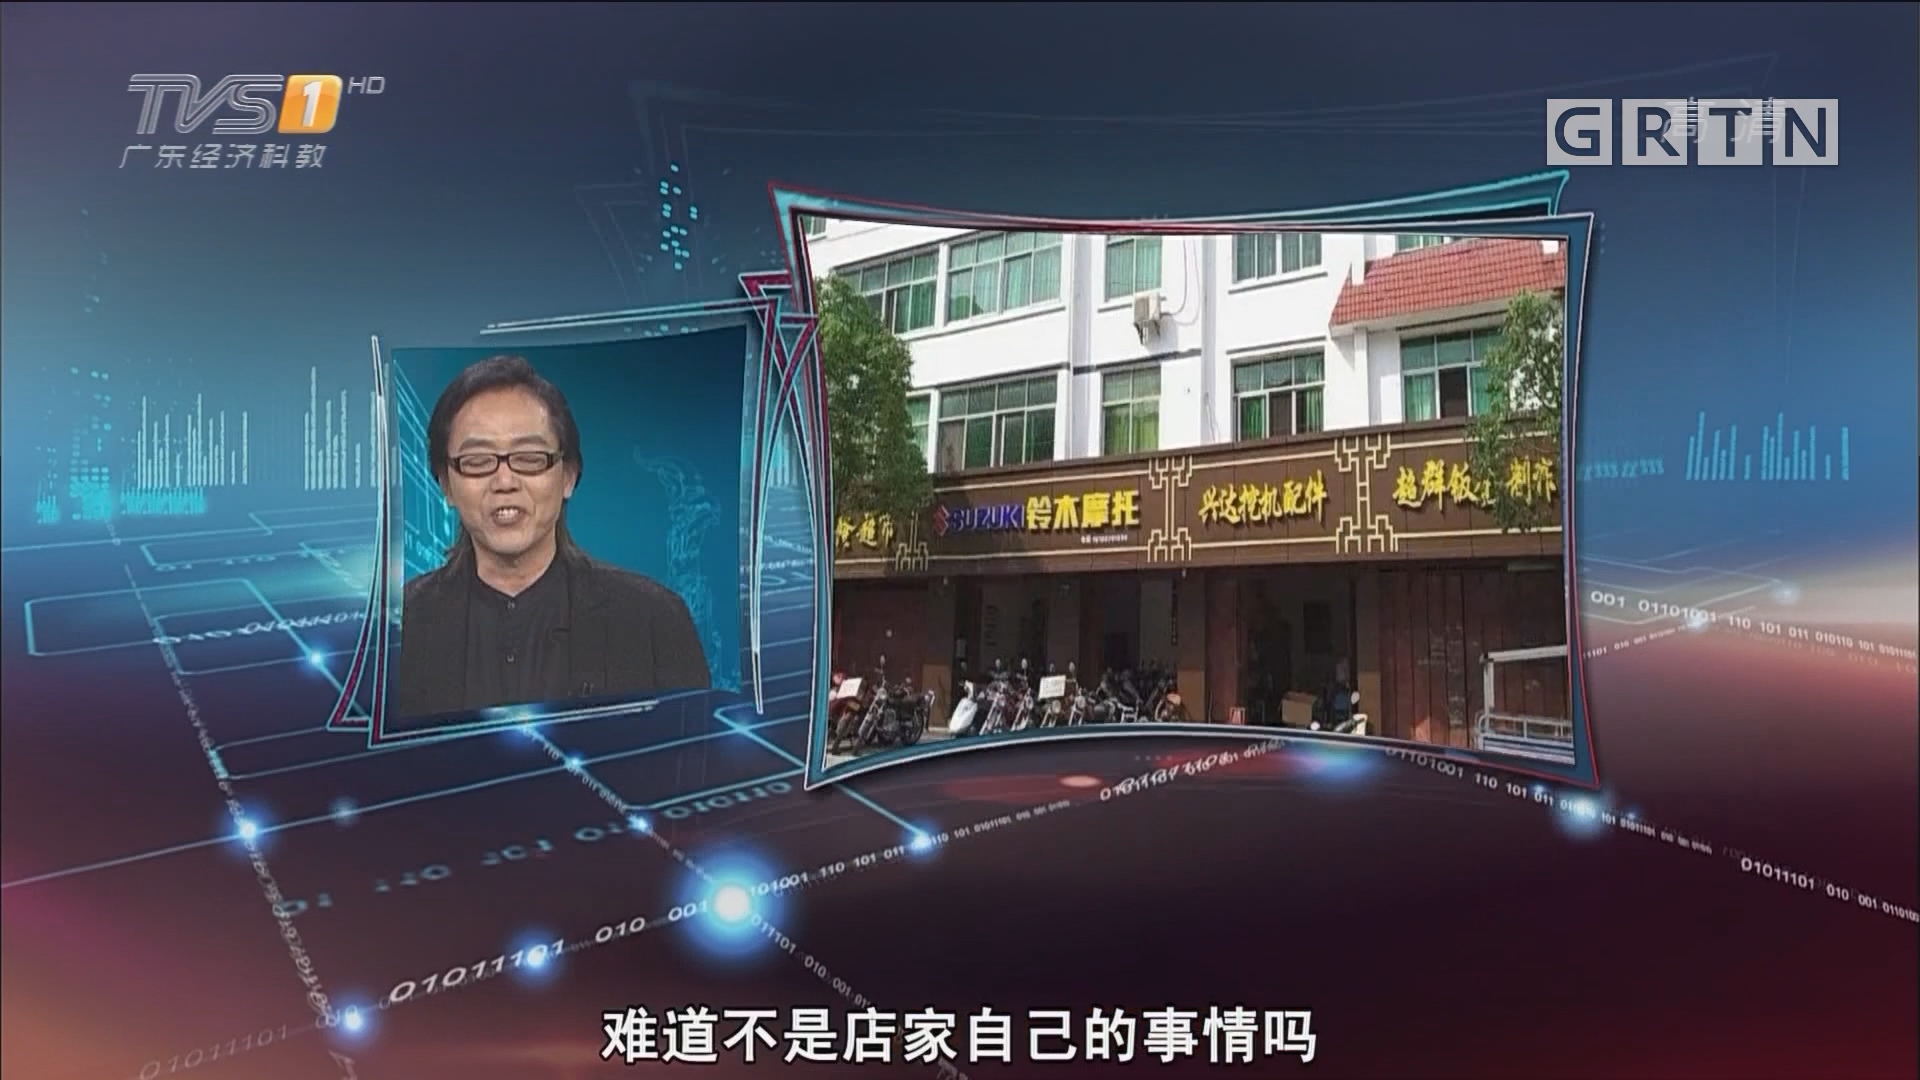 [HD][2019-03-27]马后炮:店铺招牌统一的背后是治理观念问题